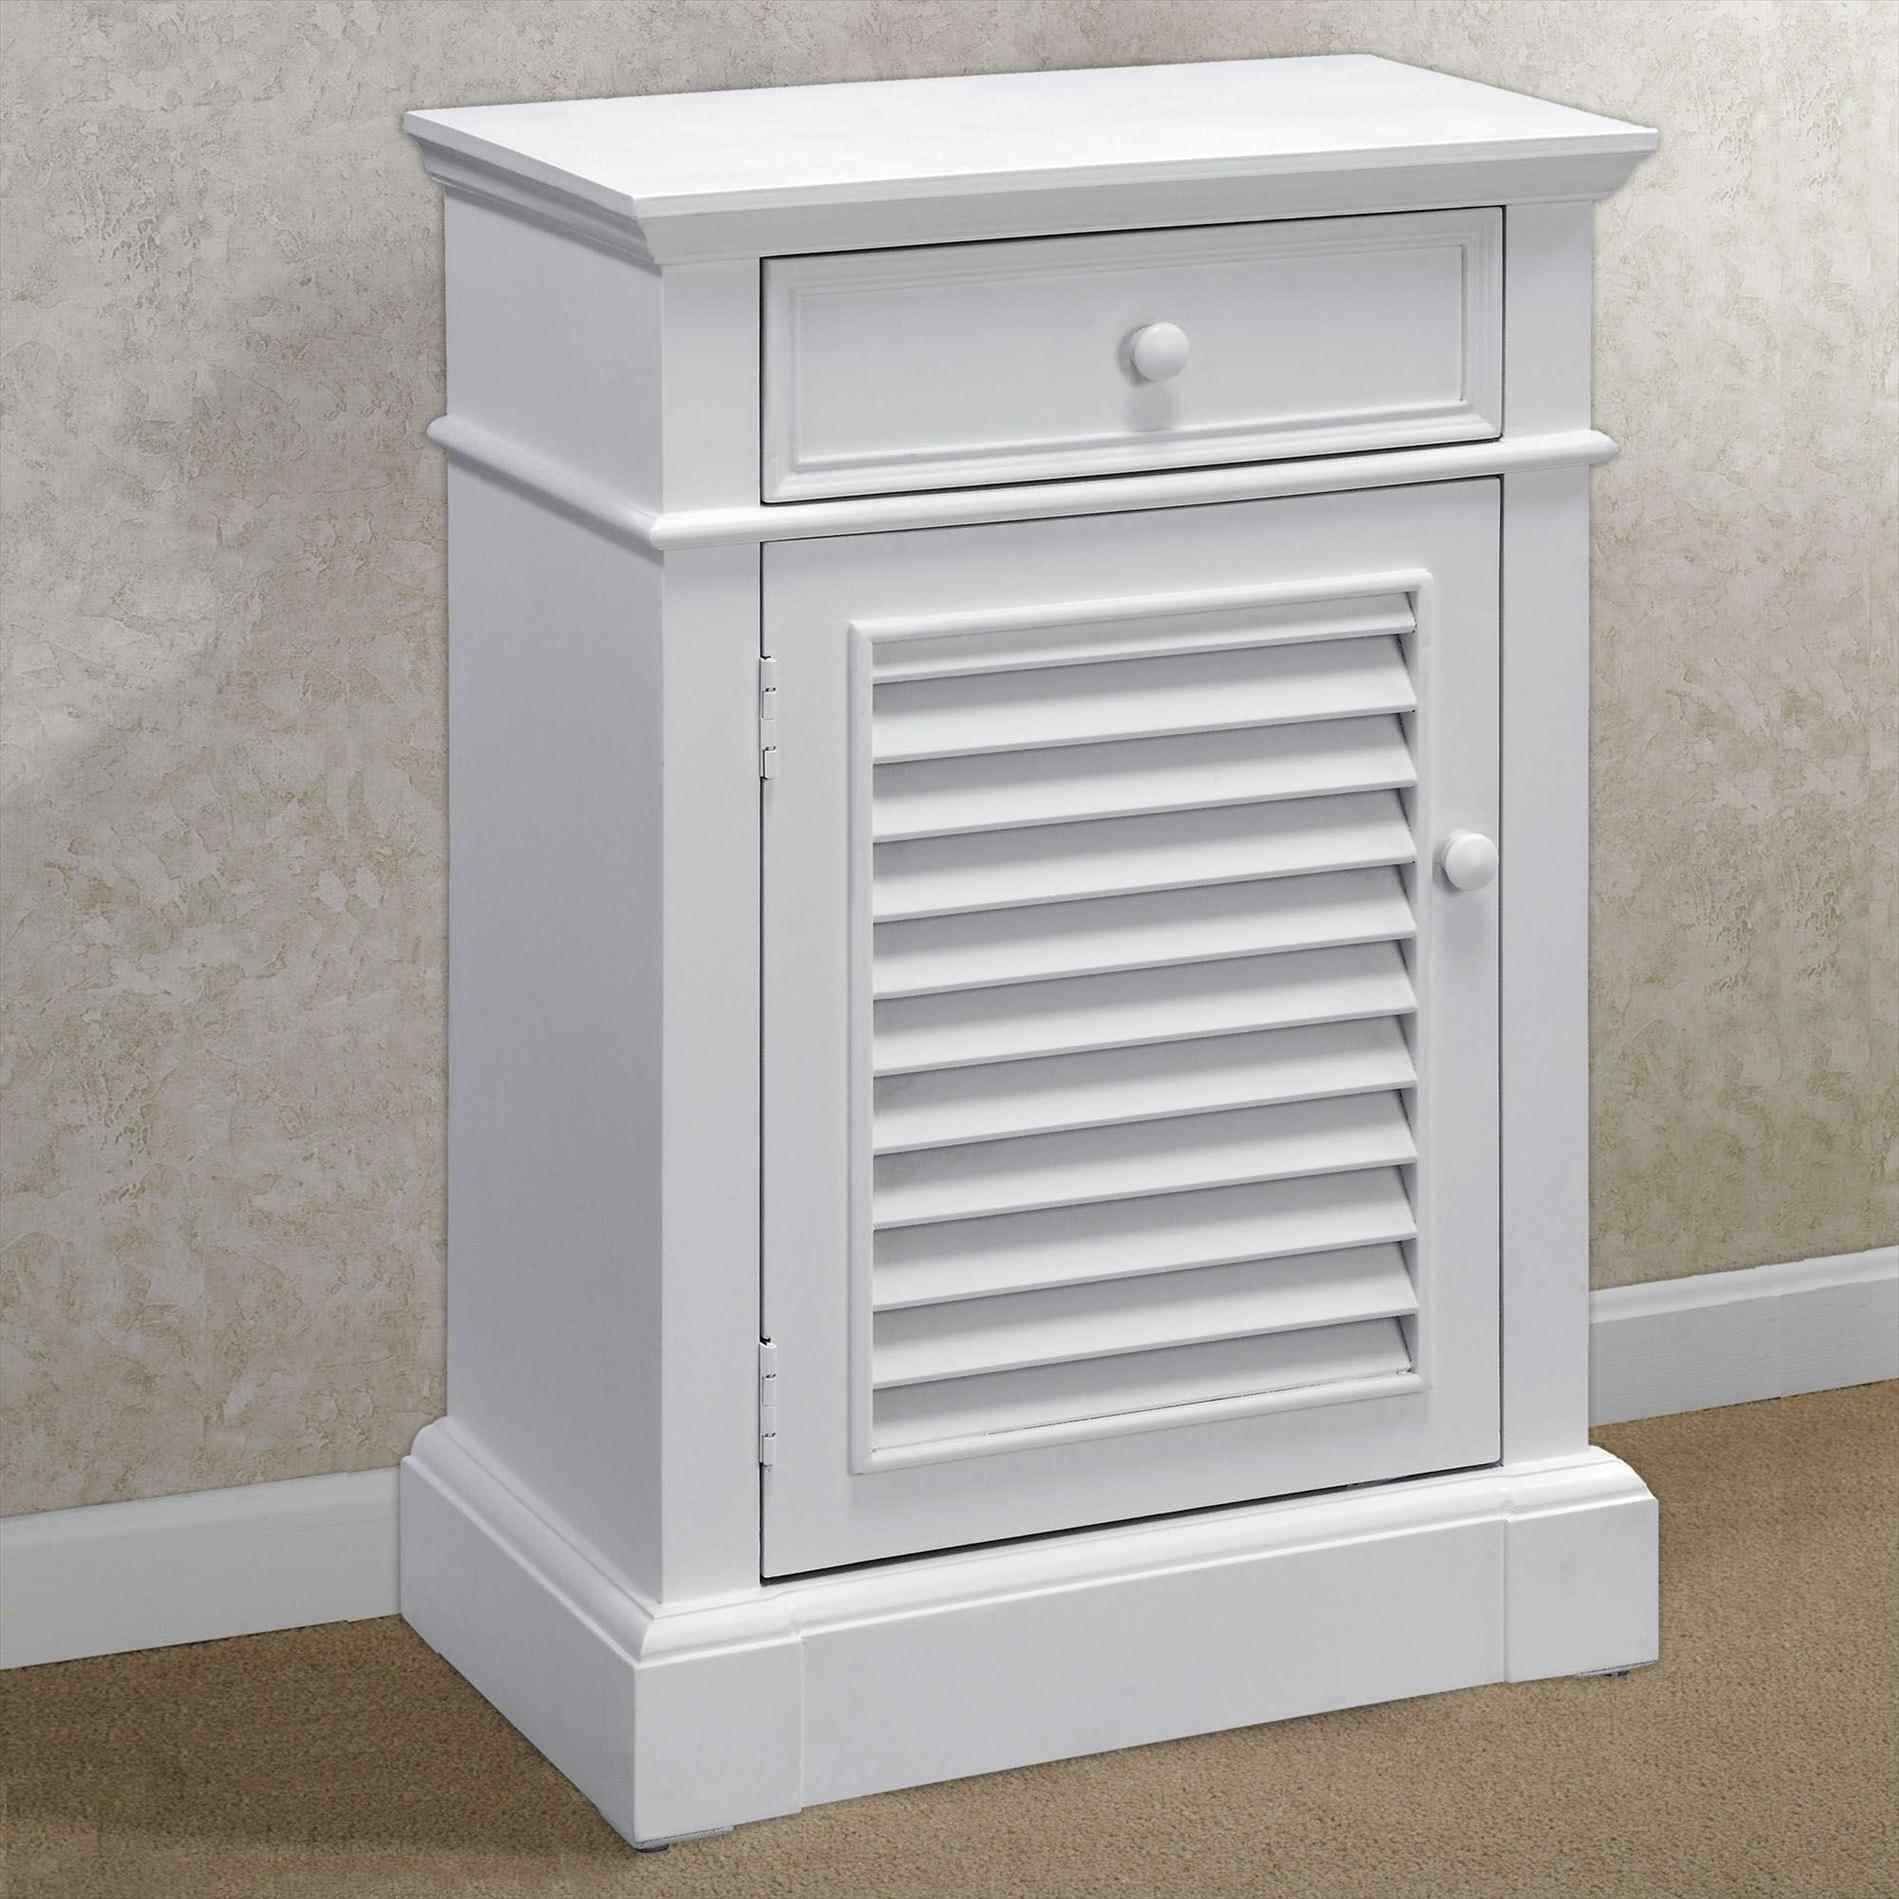 cupboard shutter designs photo - 10